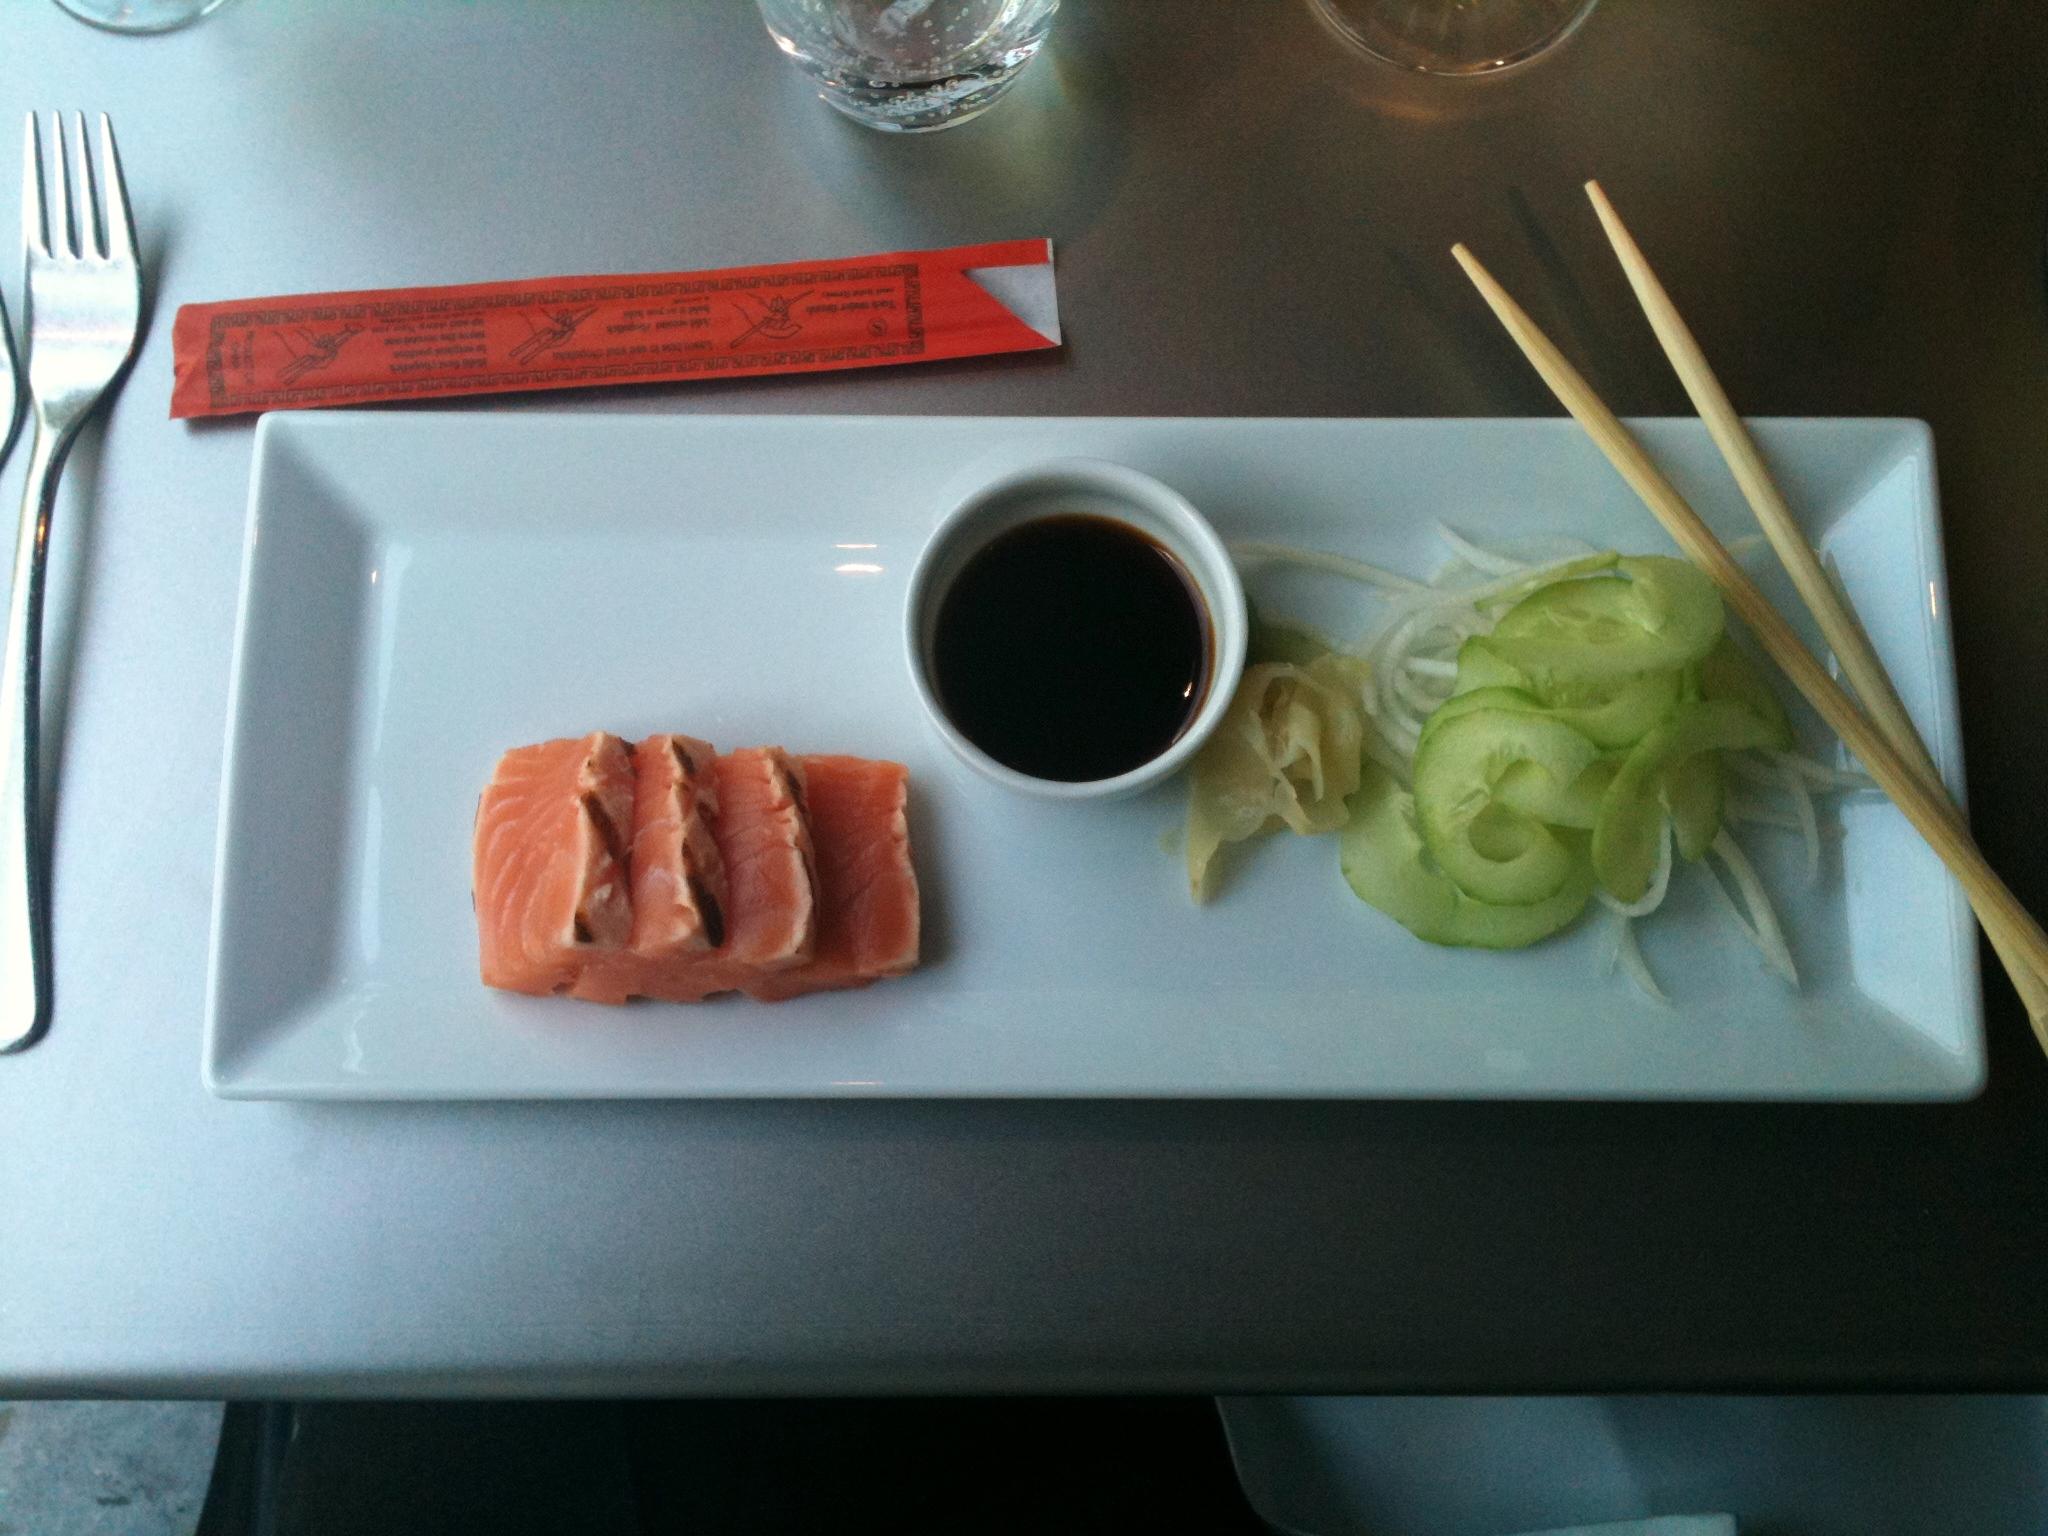 Plated coho salmon